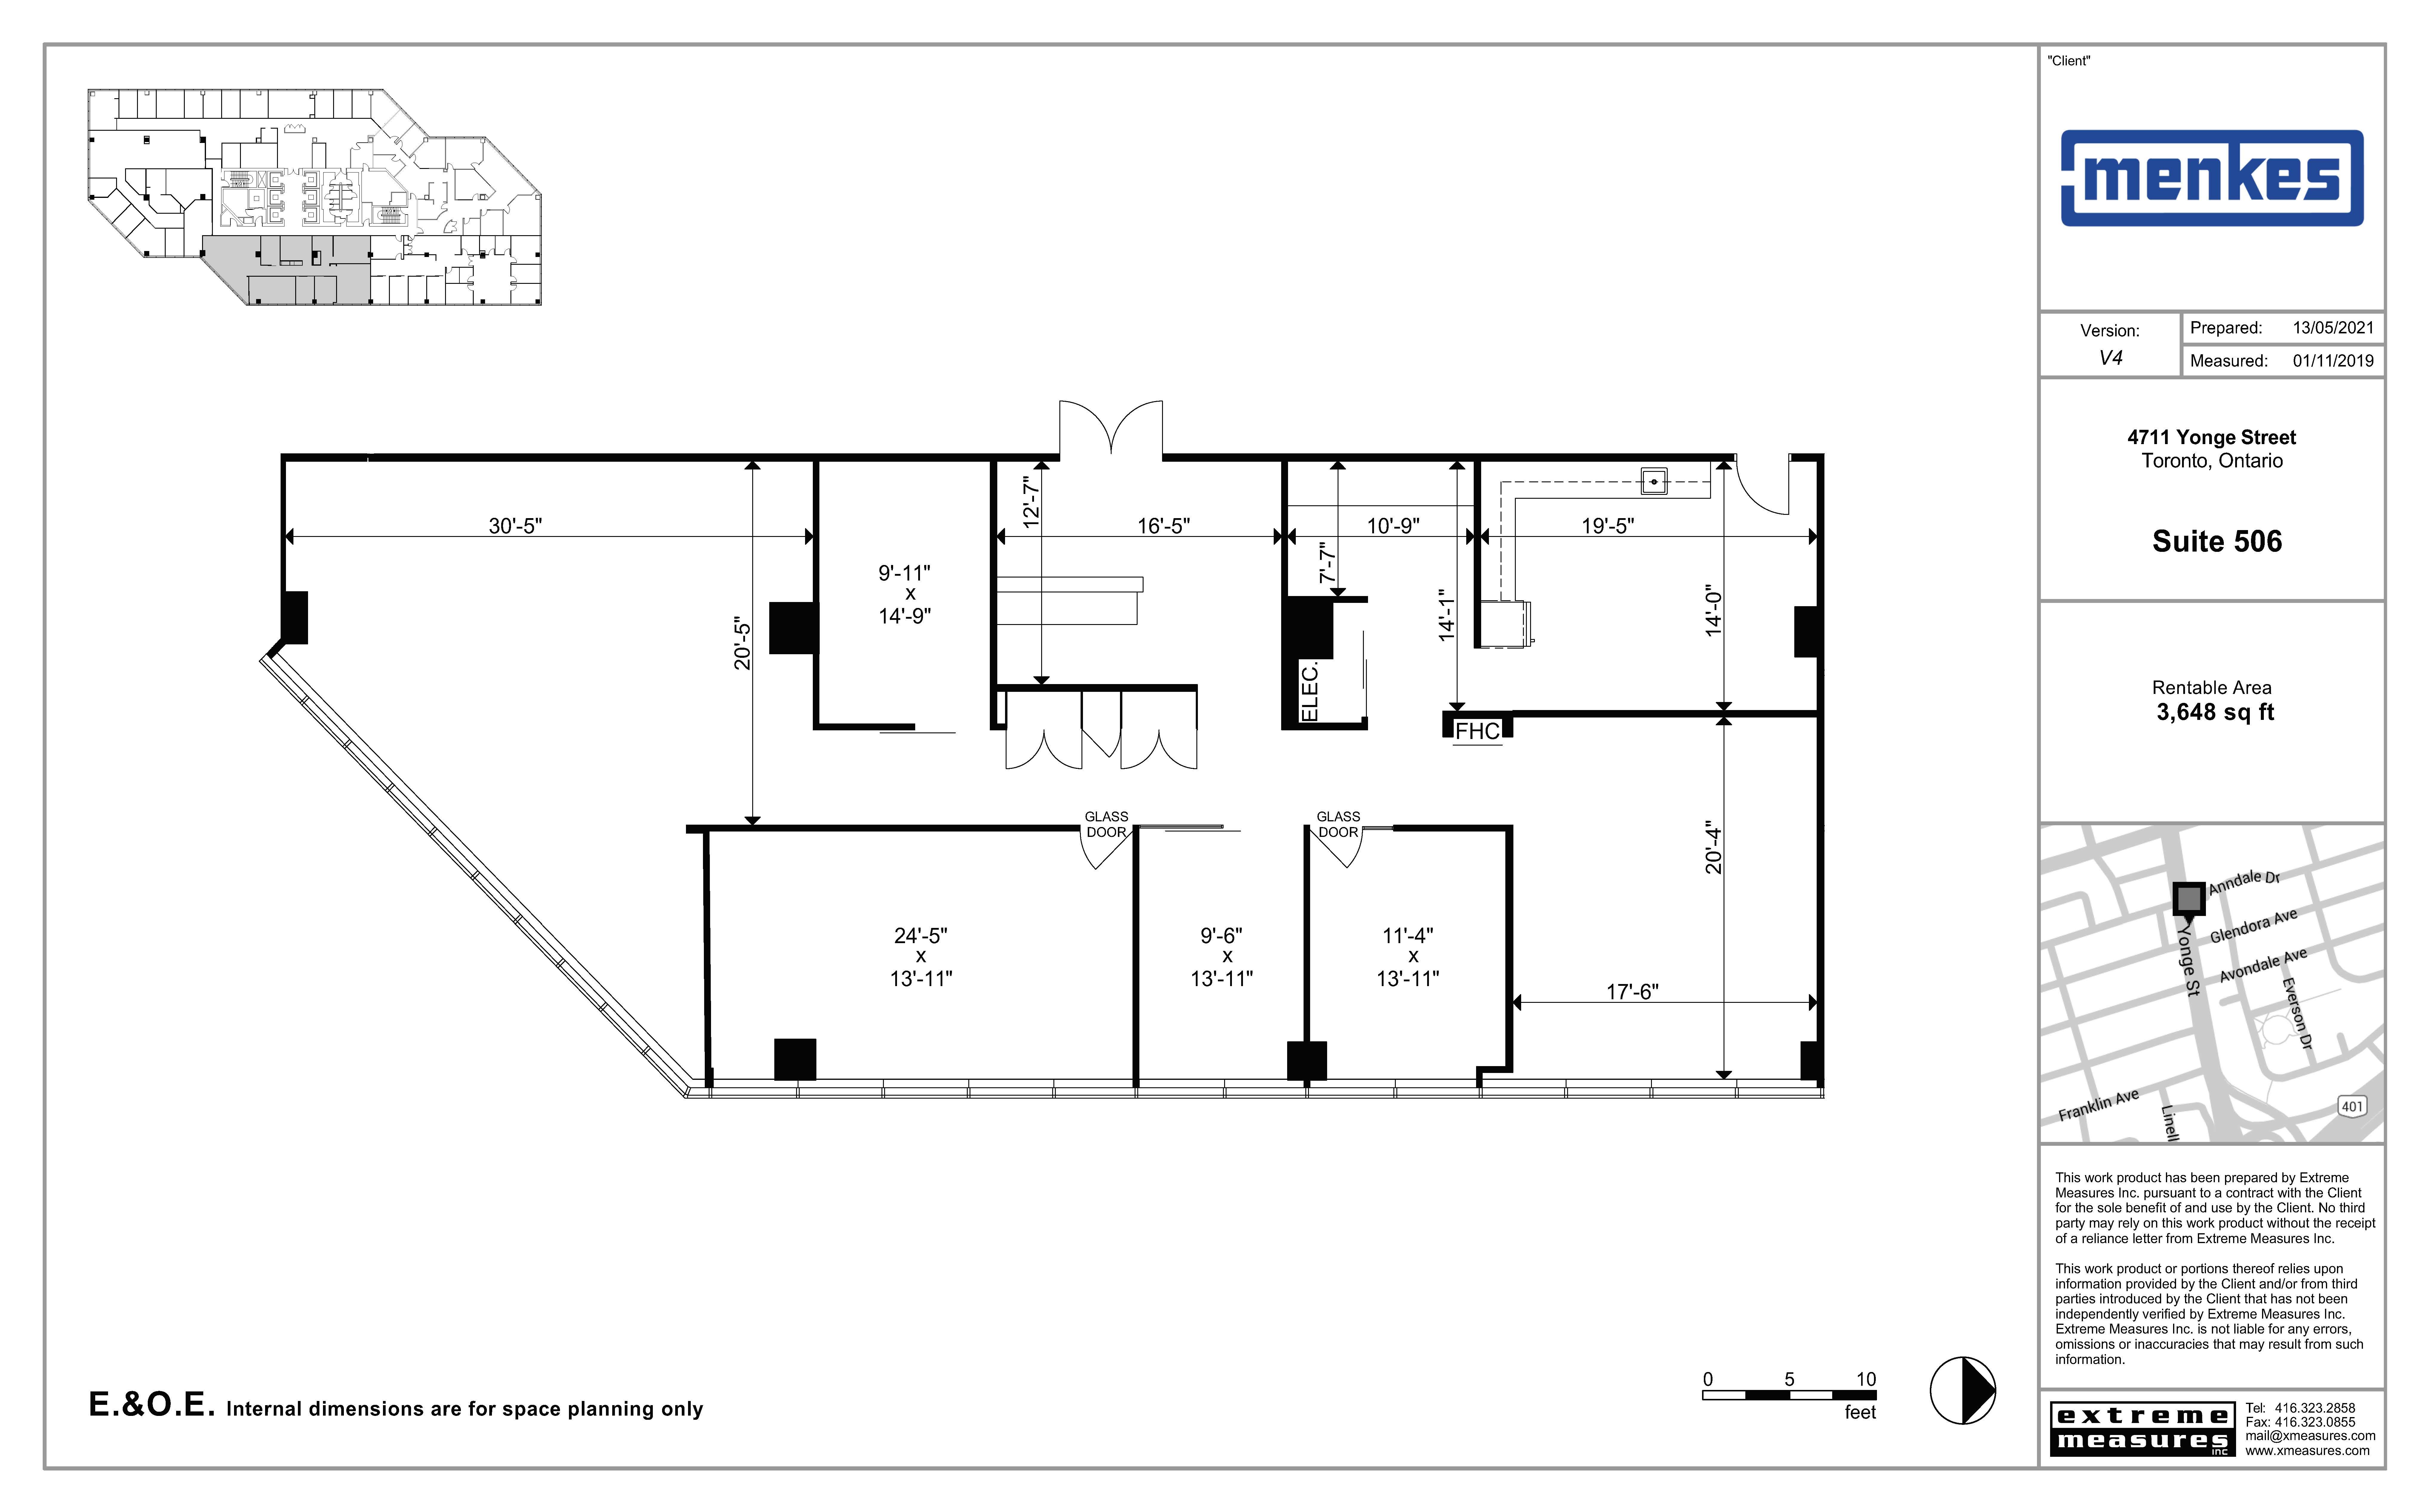 Floorplan thumbnail of Suite 506